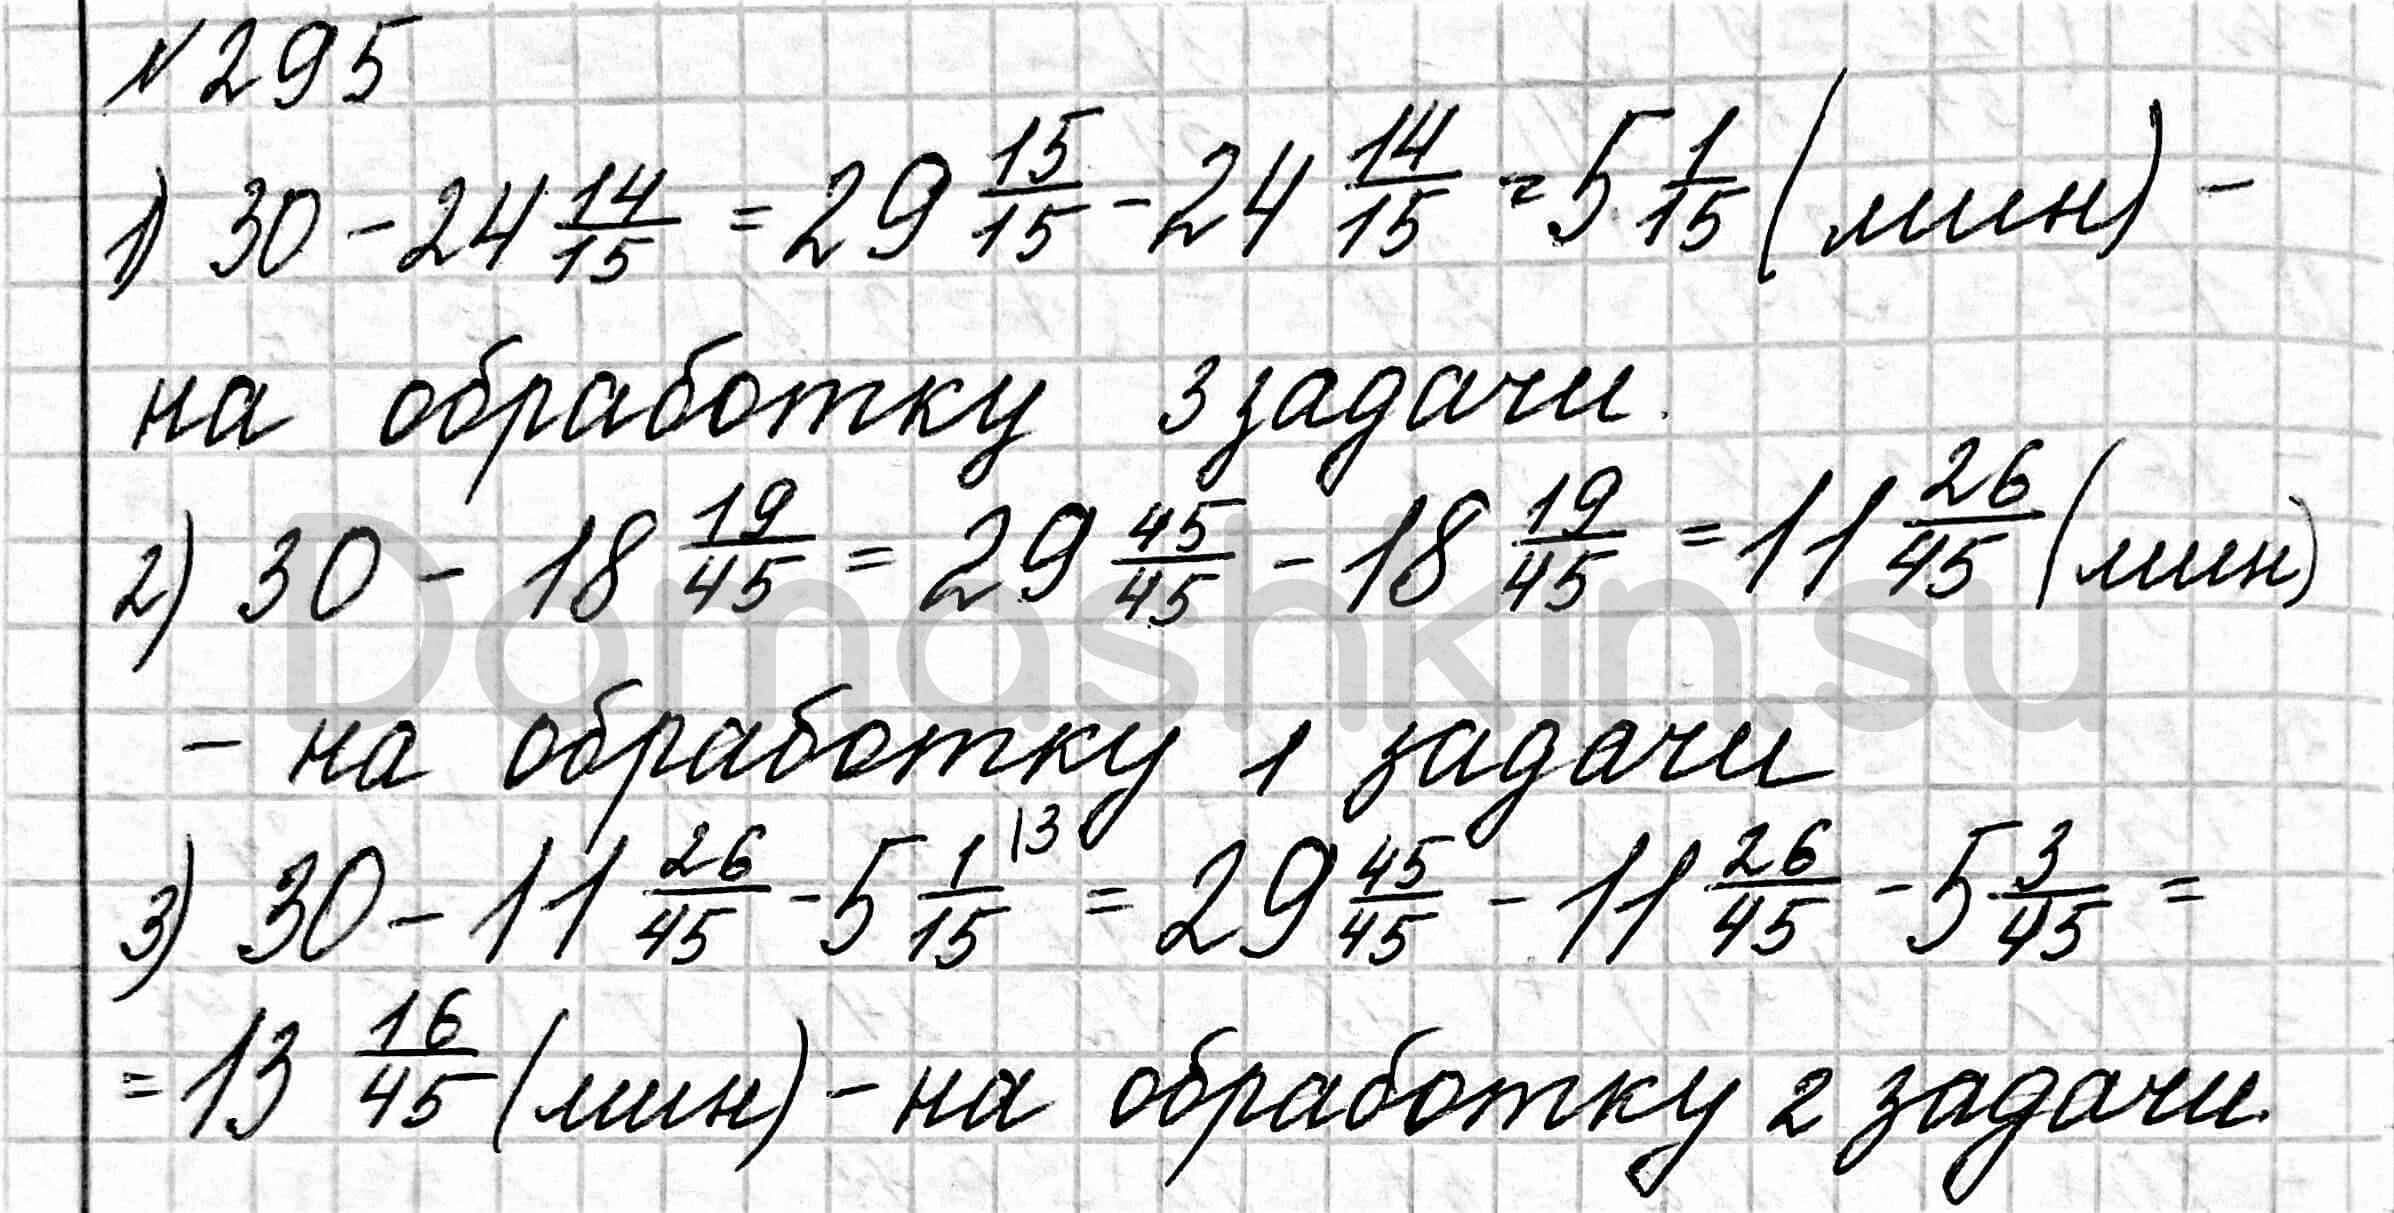 Математика 6 класс учебник Мерзляк номер 295 решение